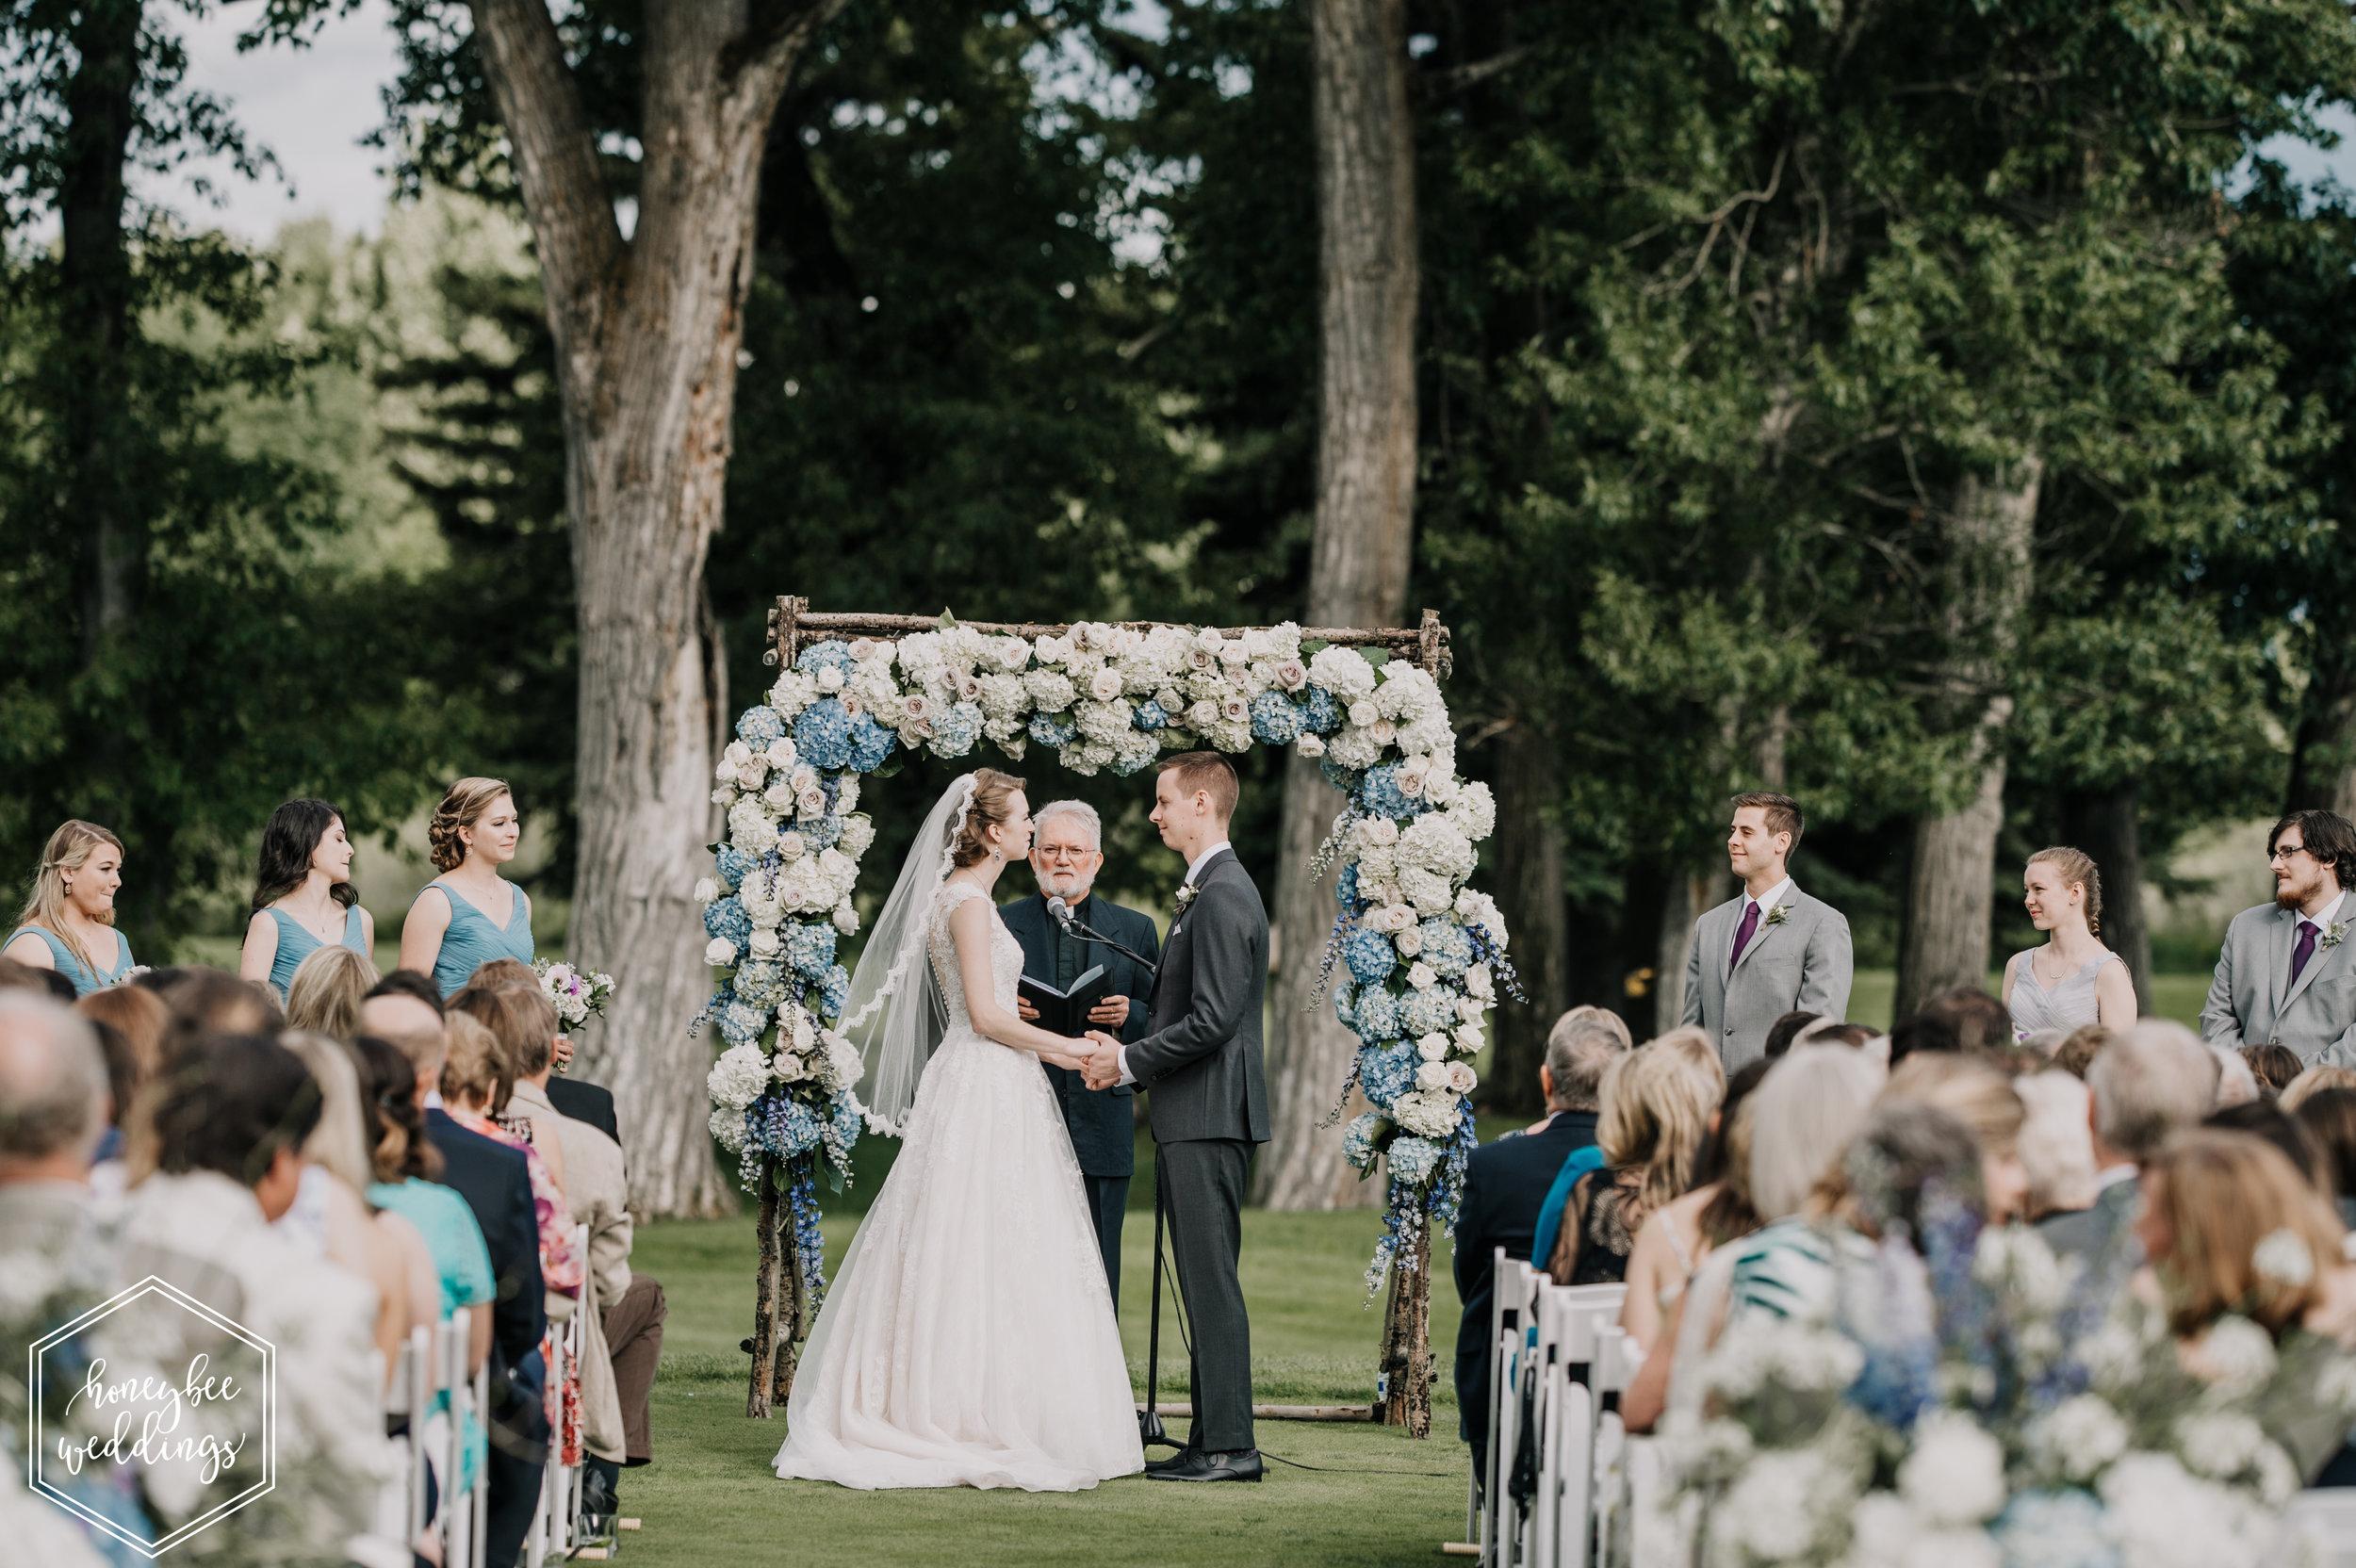 555 Riverside Country Club Wedding_Montana Wedding Photographer_Lauren Jackson + Evan Ivaldi 2018-6683.jpg